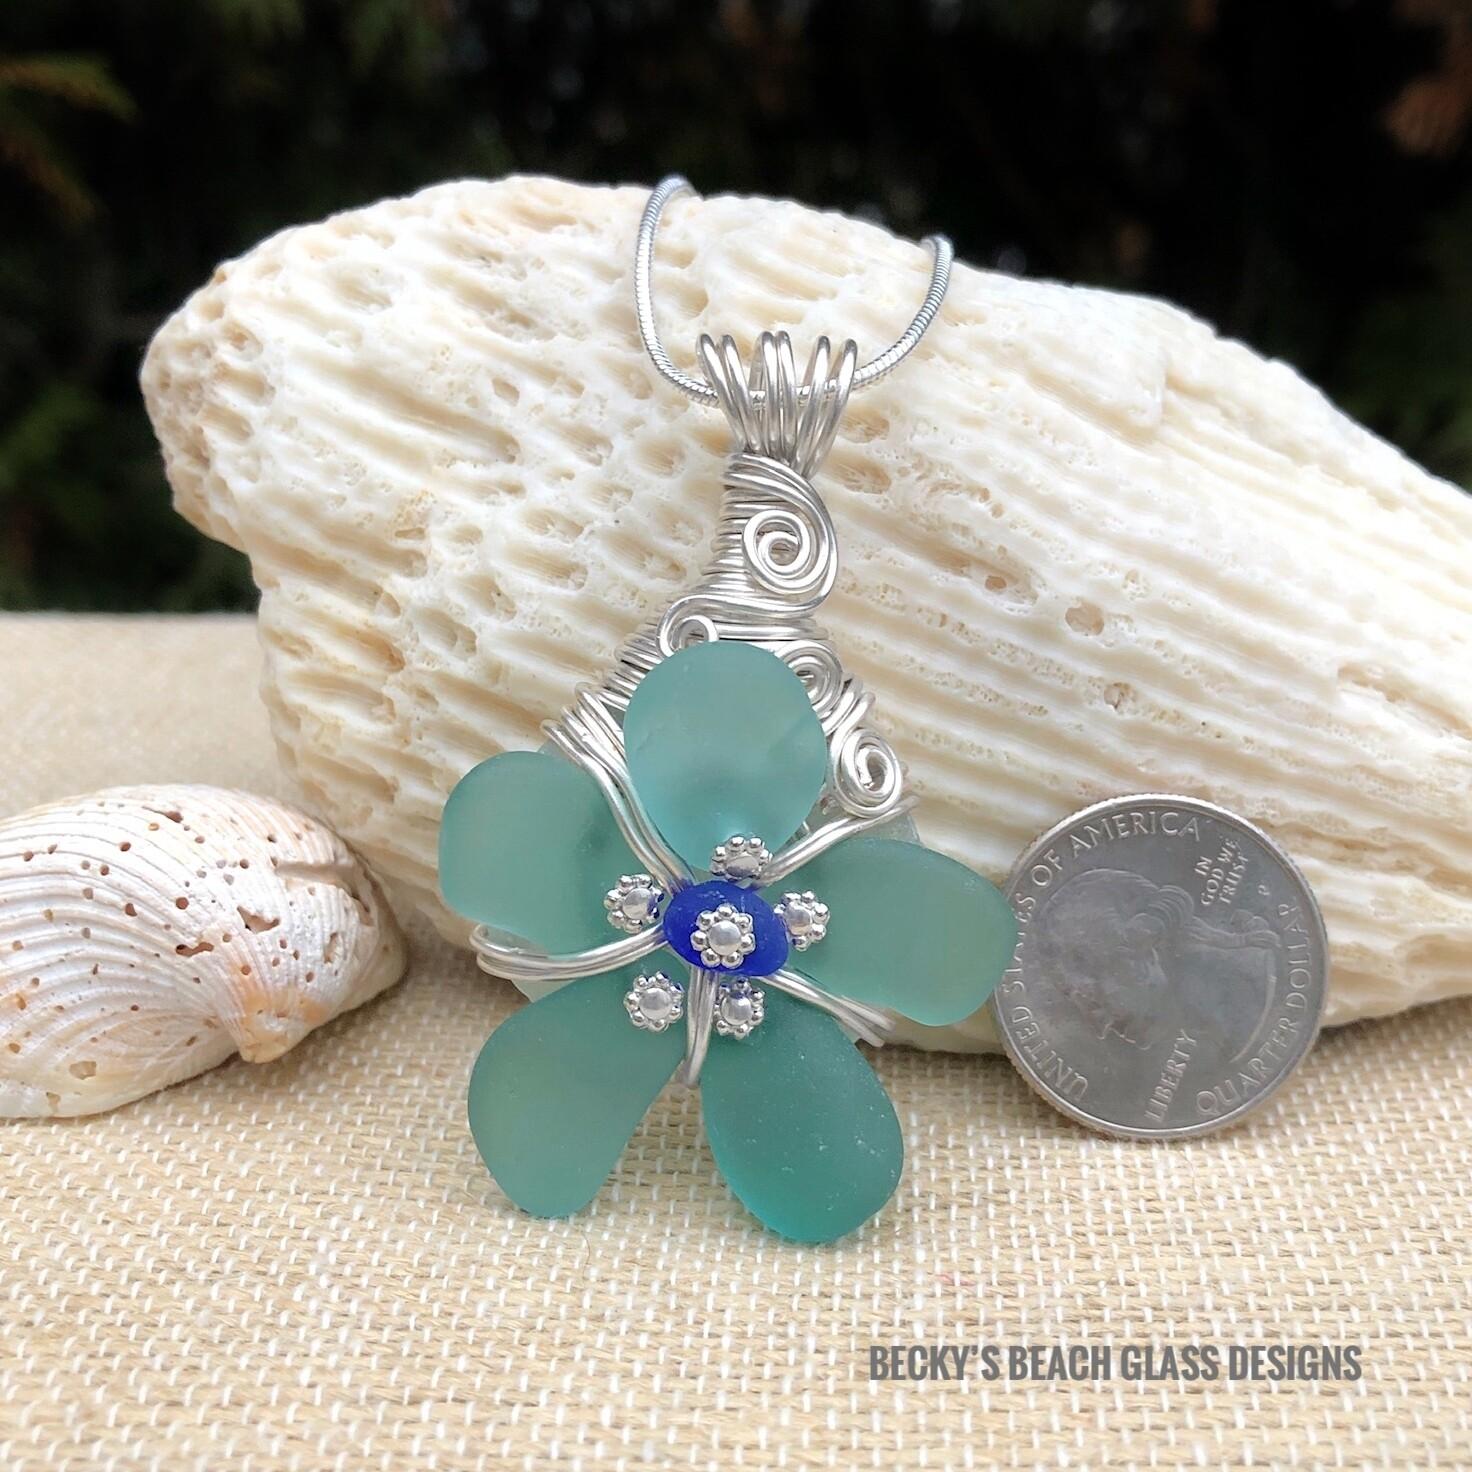 Russian Sea Glass Flower Pendant Necklace w/Cobalt Center